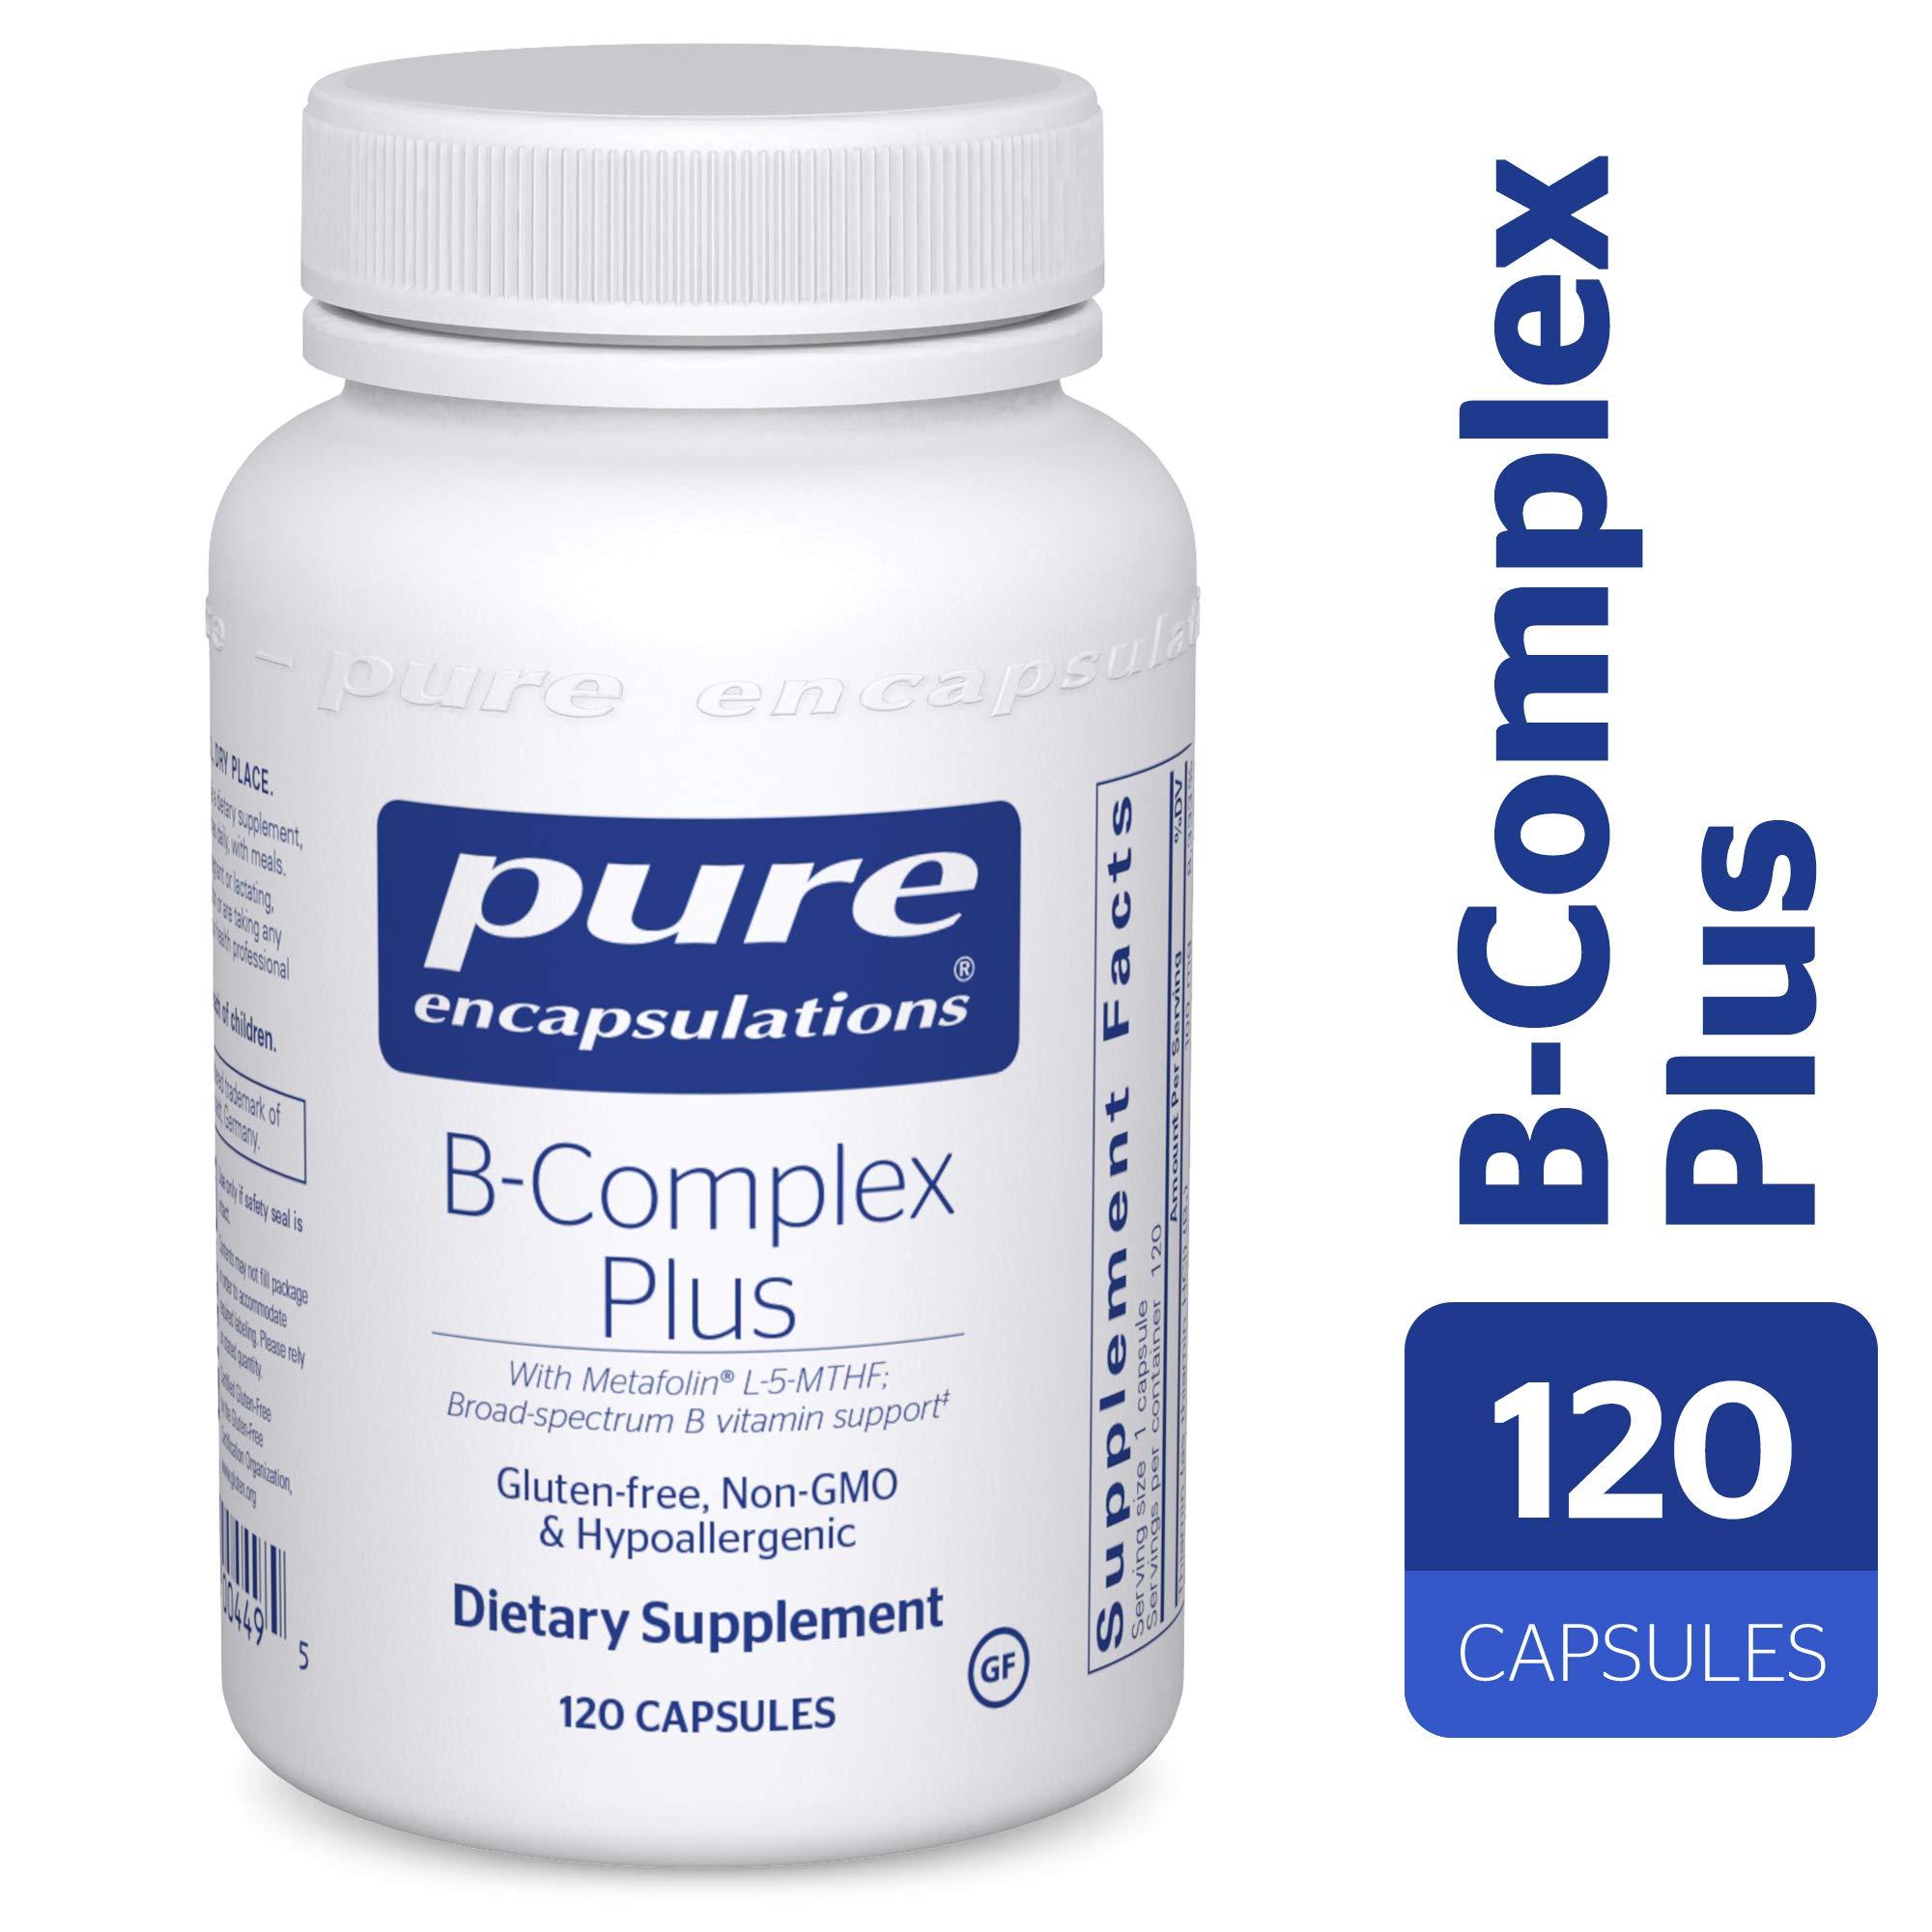 Pure Encapsulations - B-Complex Plus - Balanced B Vitamin Formula with Metafolin® L-5-MTHF and Vitamin B12 - 120 Count by Pure Encapsulations